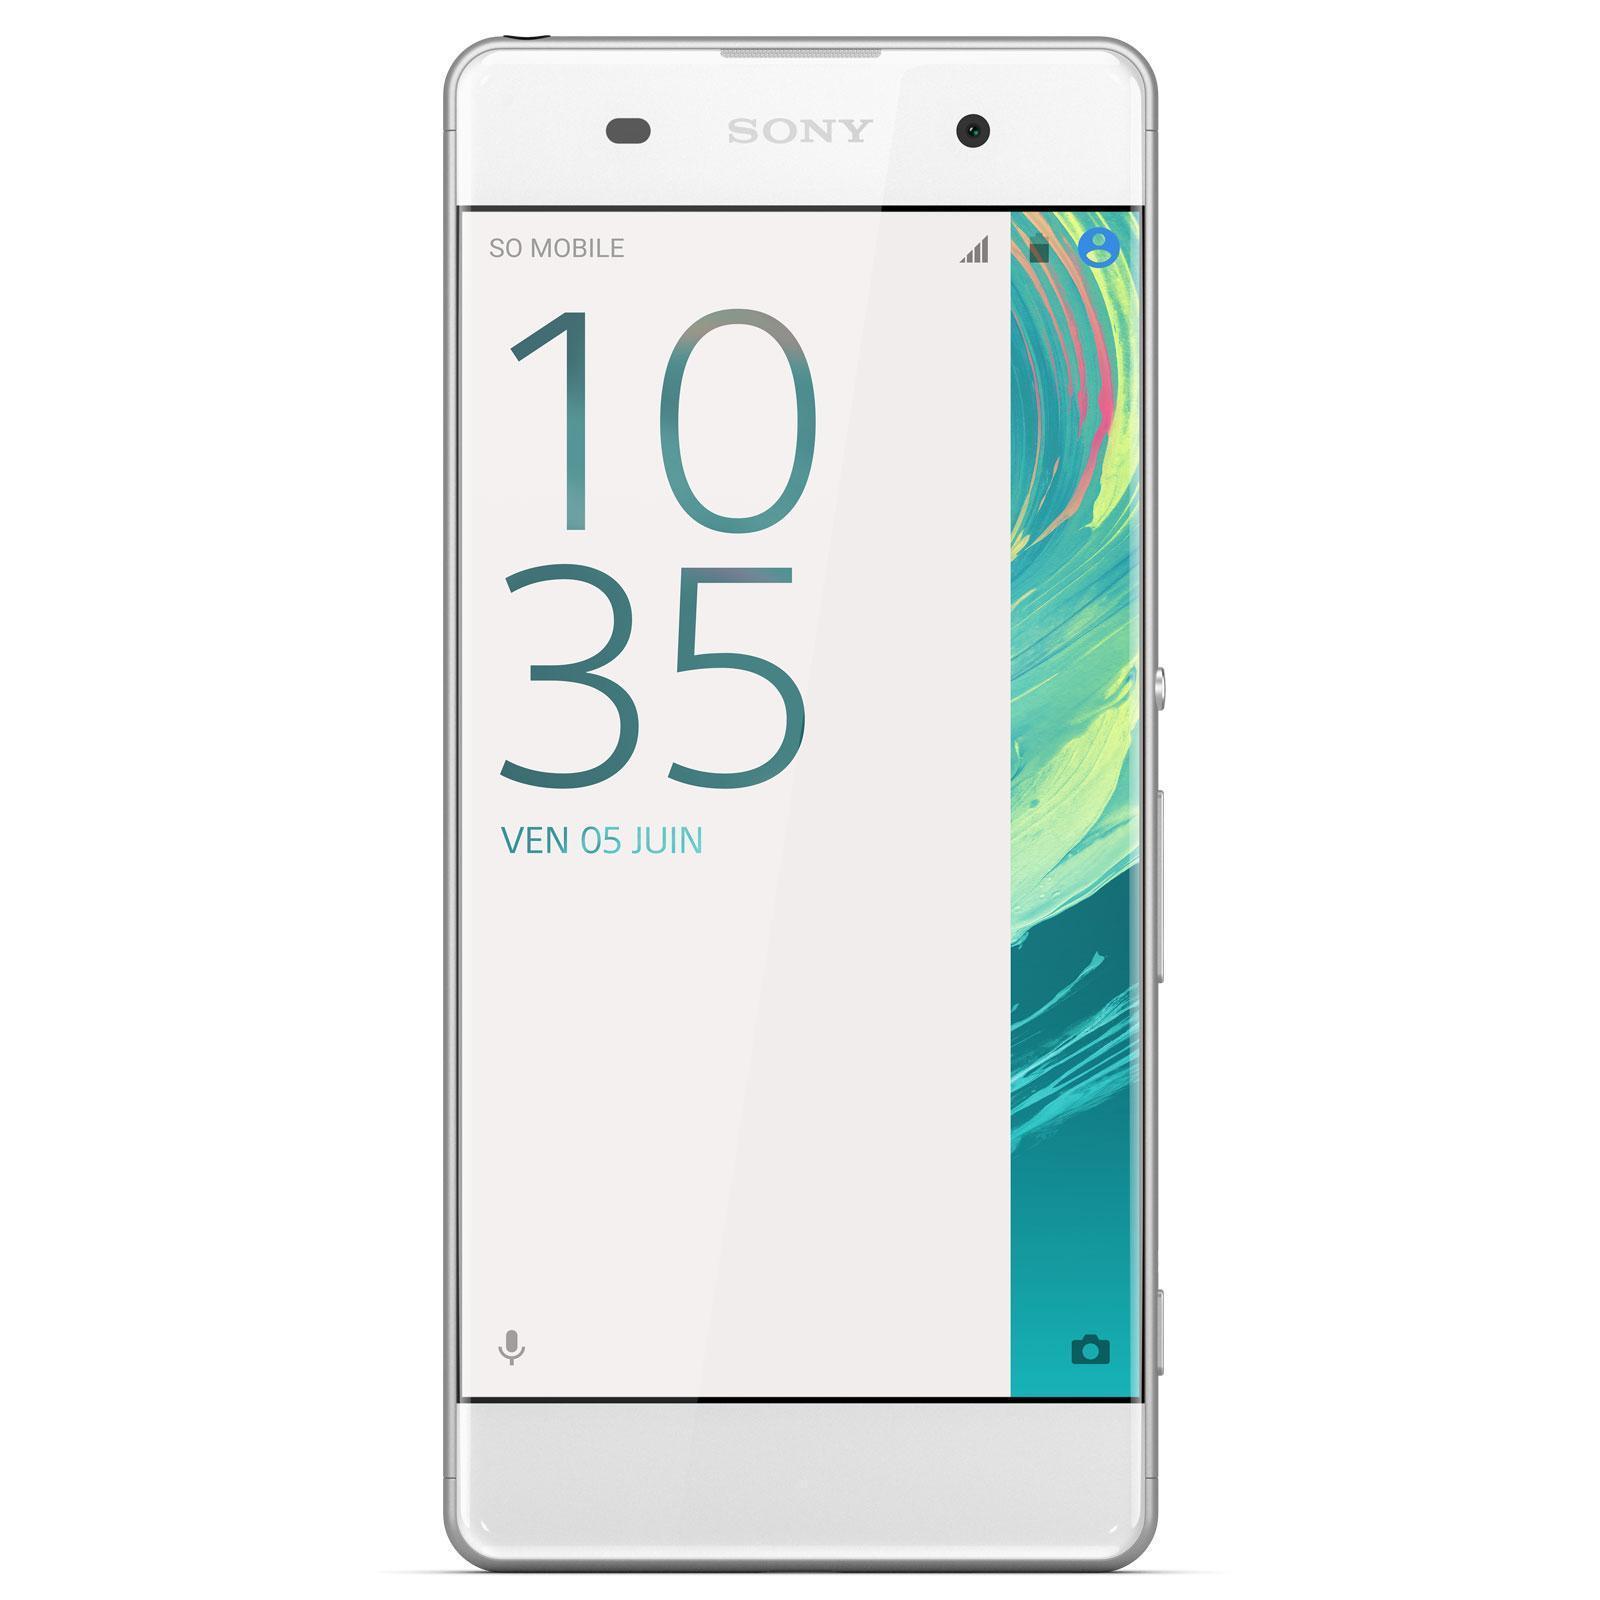 Sony Xperia XA 16 Go - Blanc - Débloqué